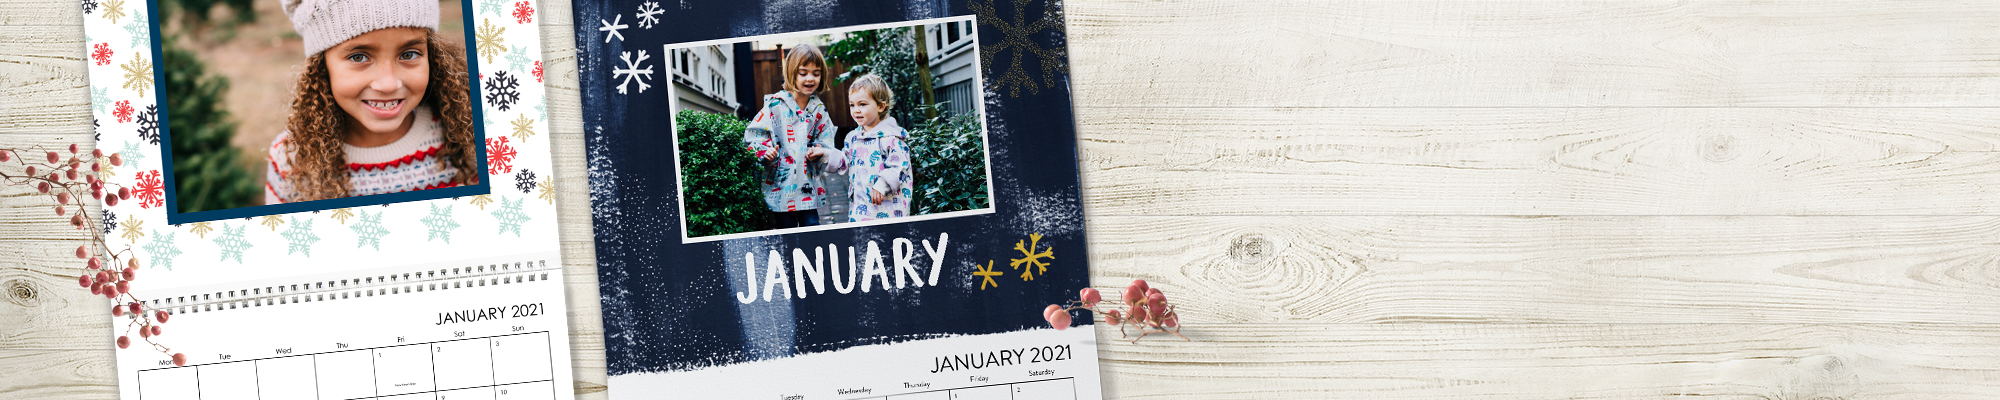 2021 Photo Calendars